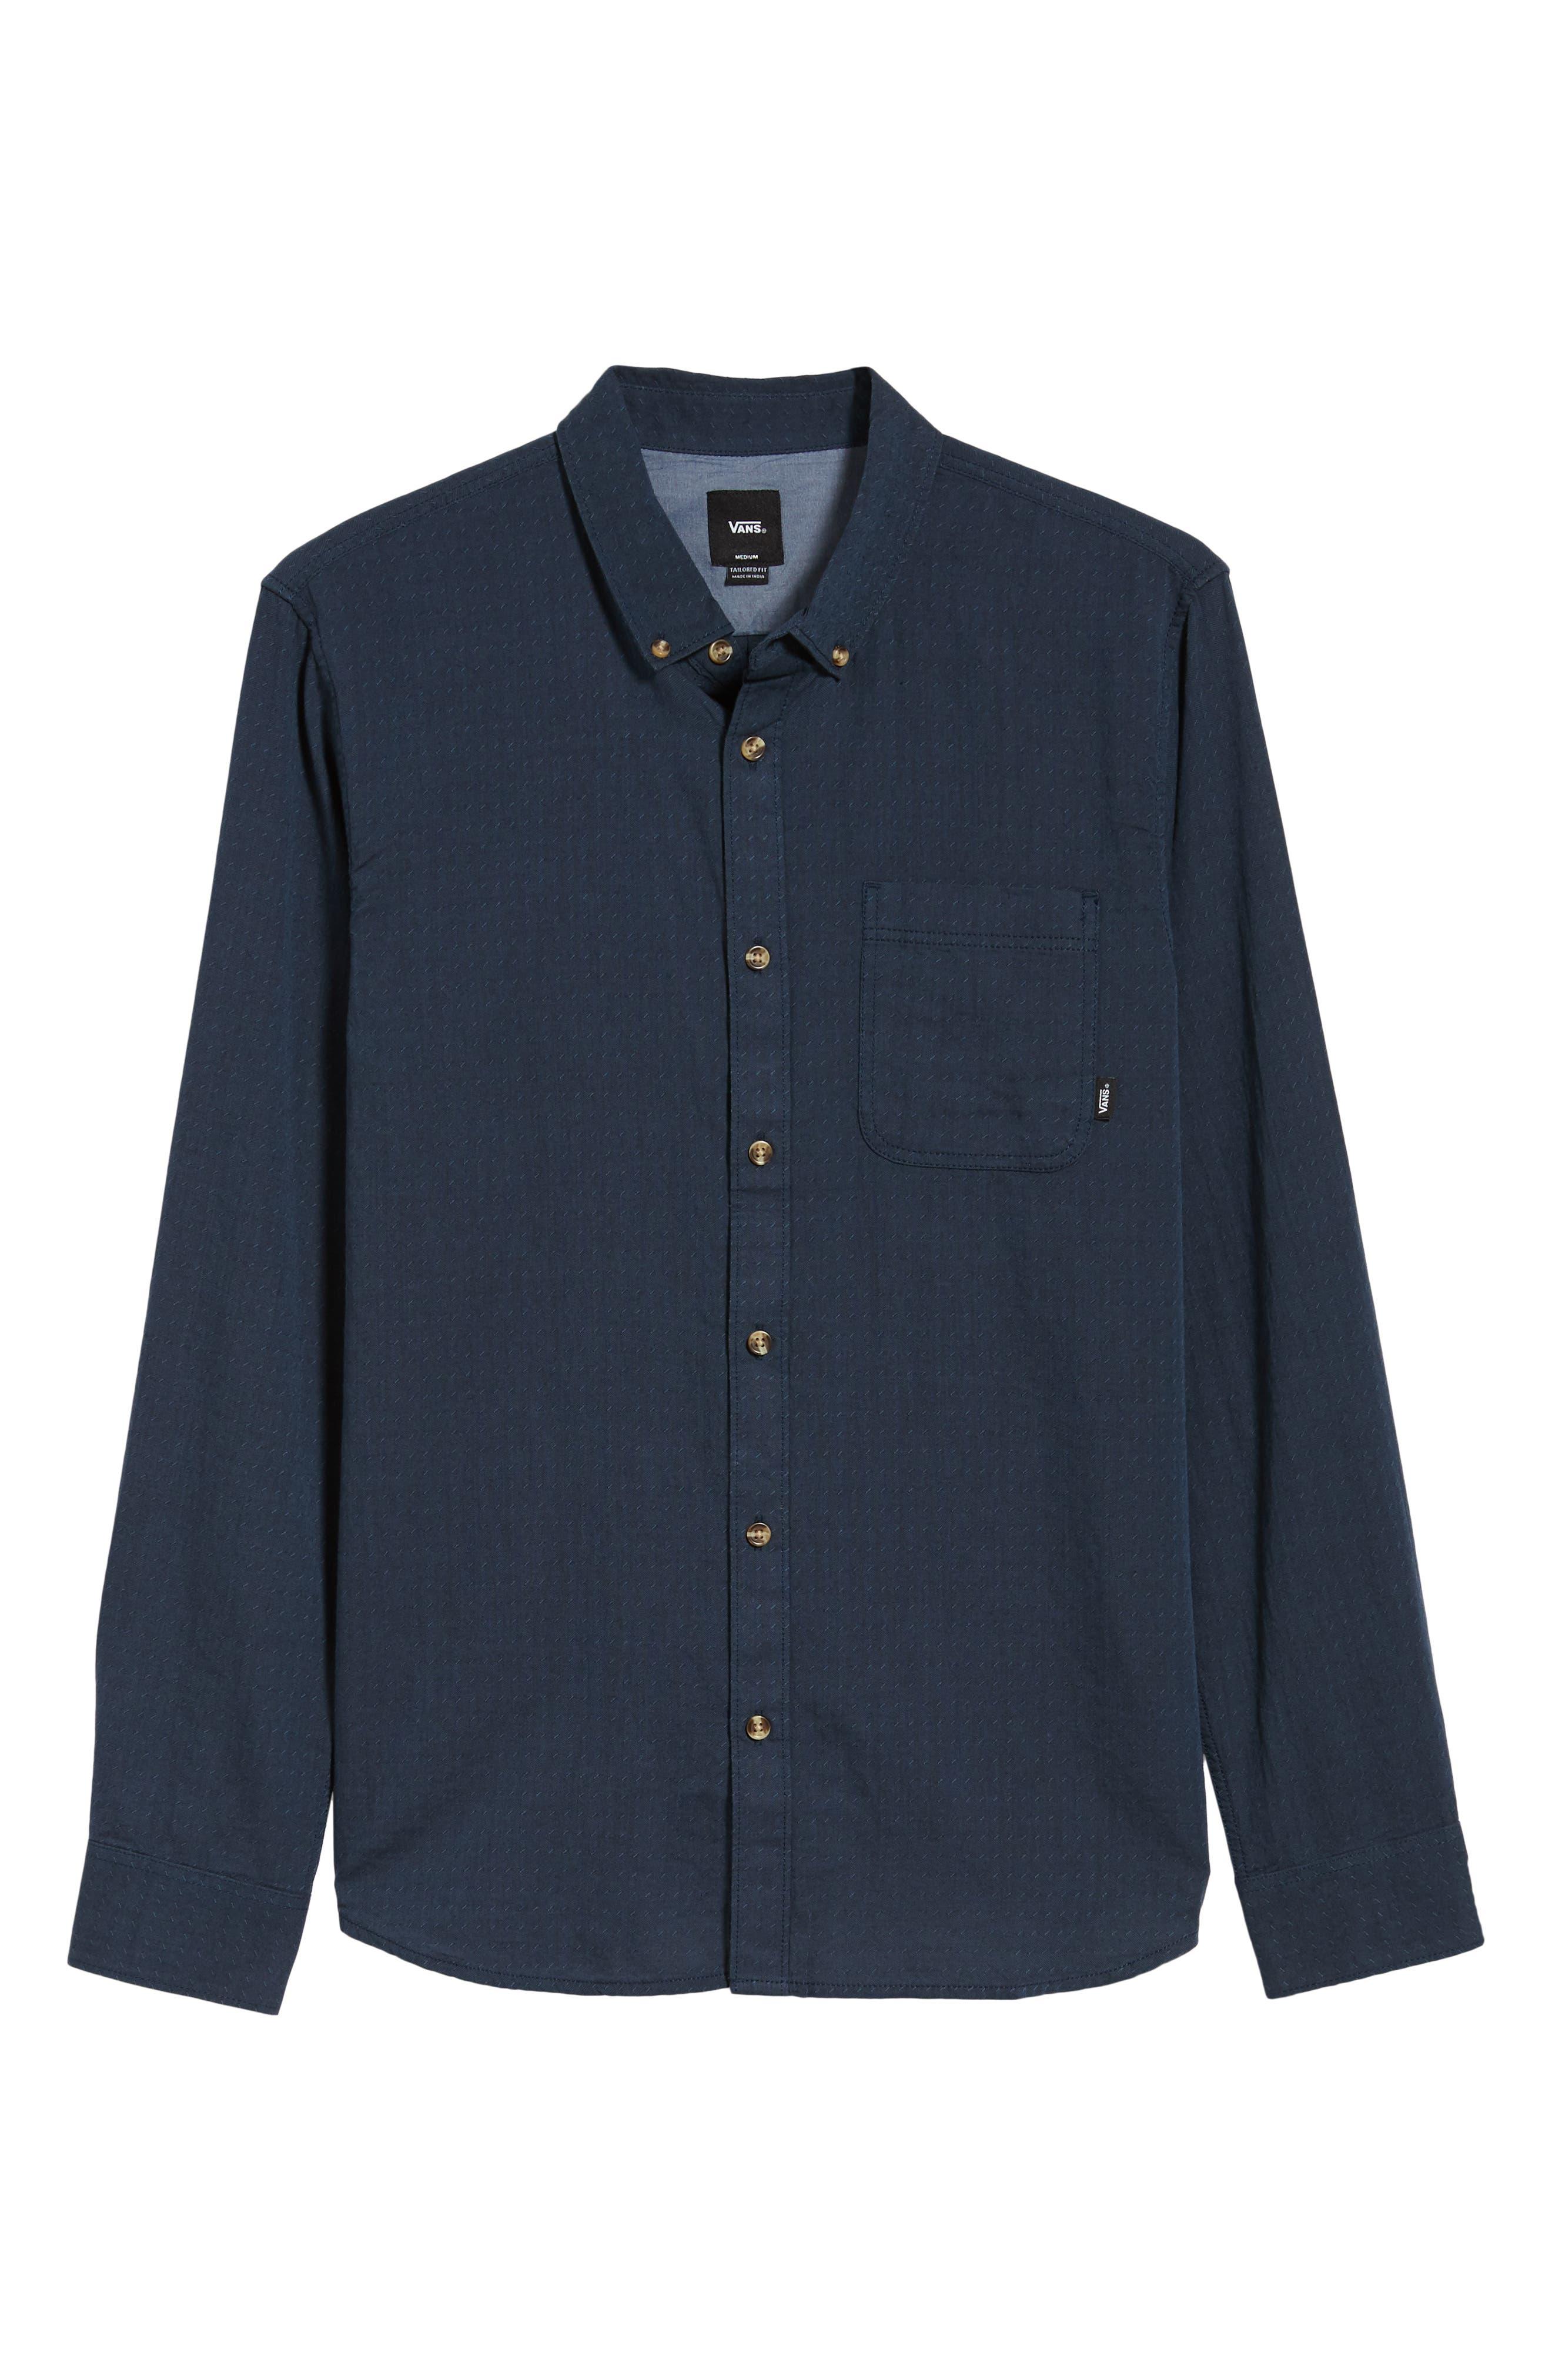 Wakefield Woven Shirt,                             Alternate thumbnail 5, color,                             DRESS BLUES